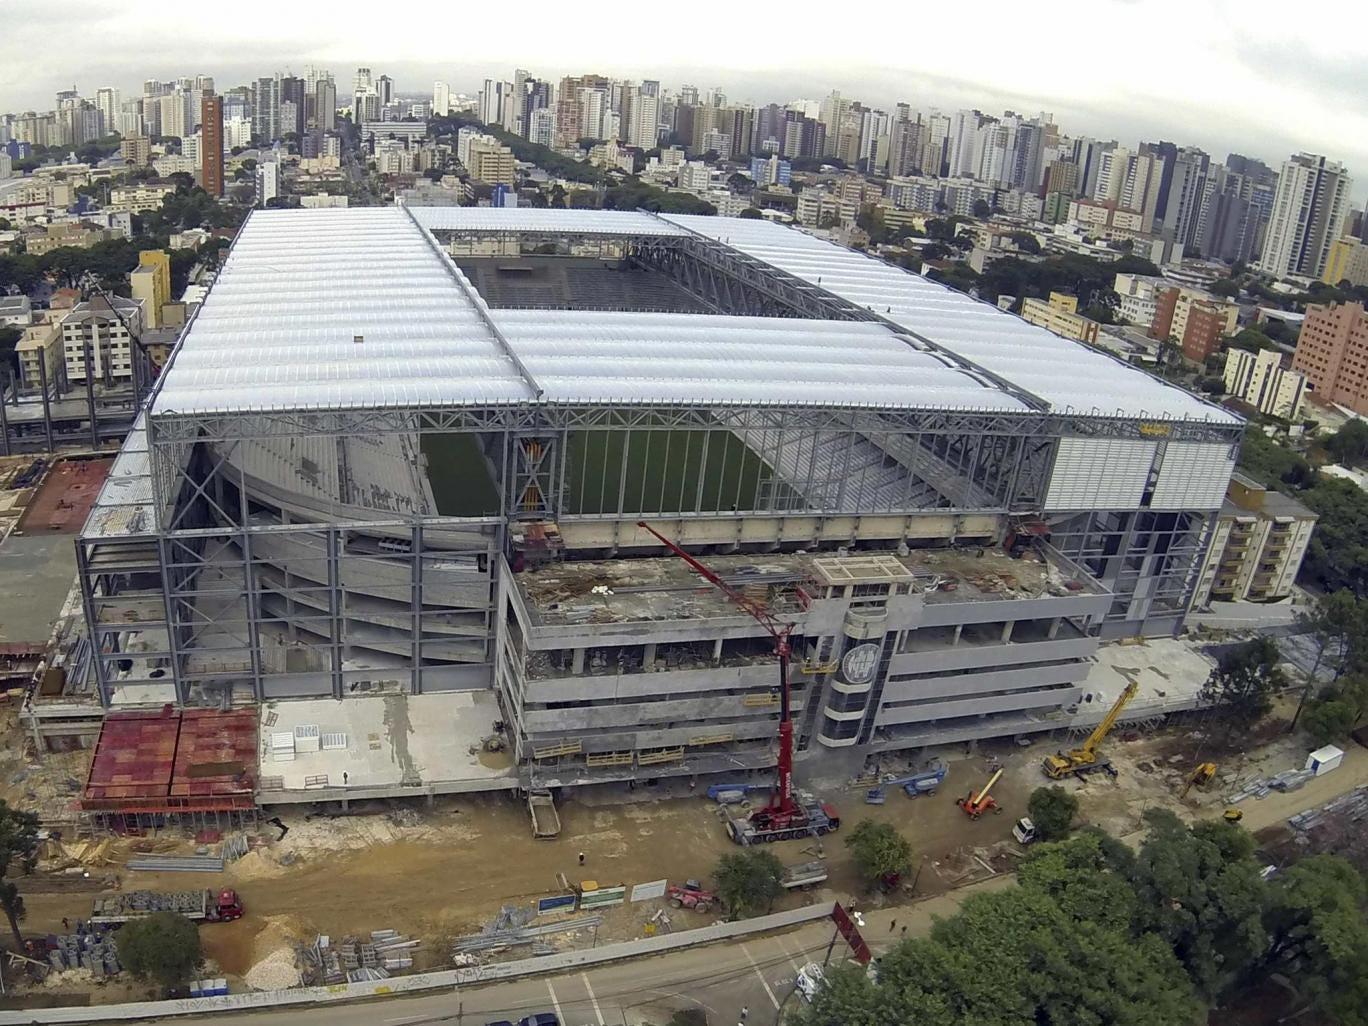 Work in progress at the Arena da Baixada